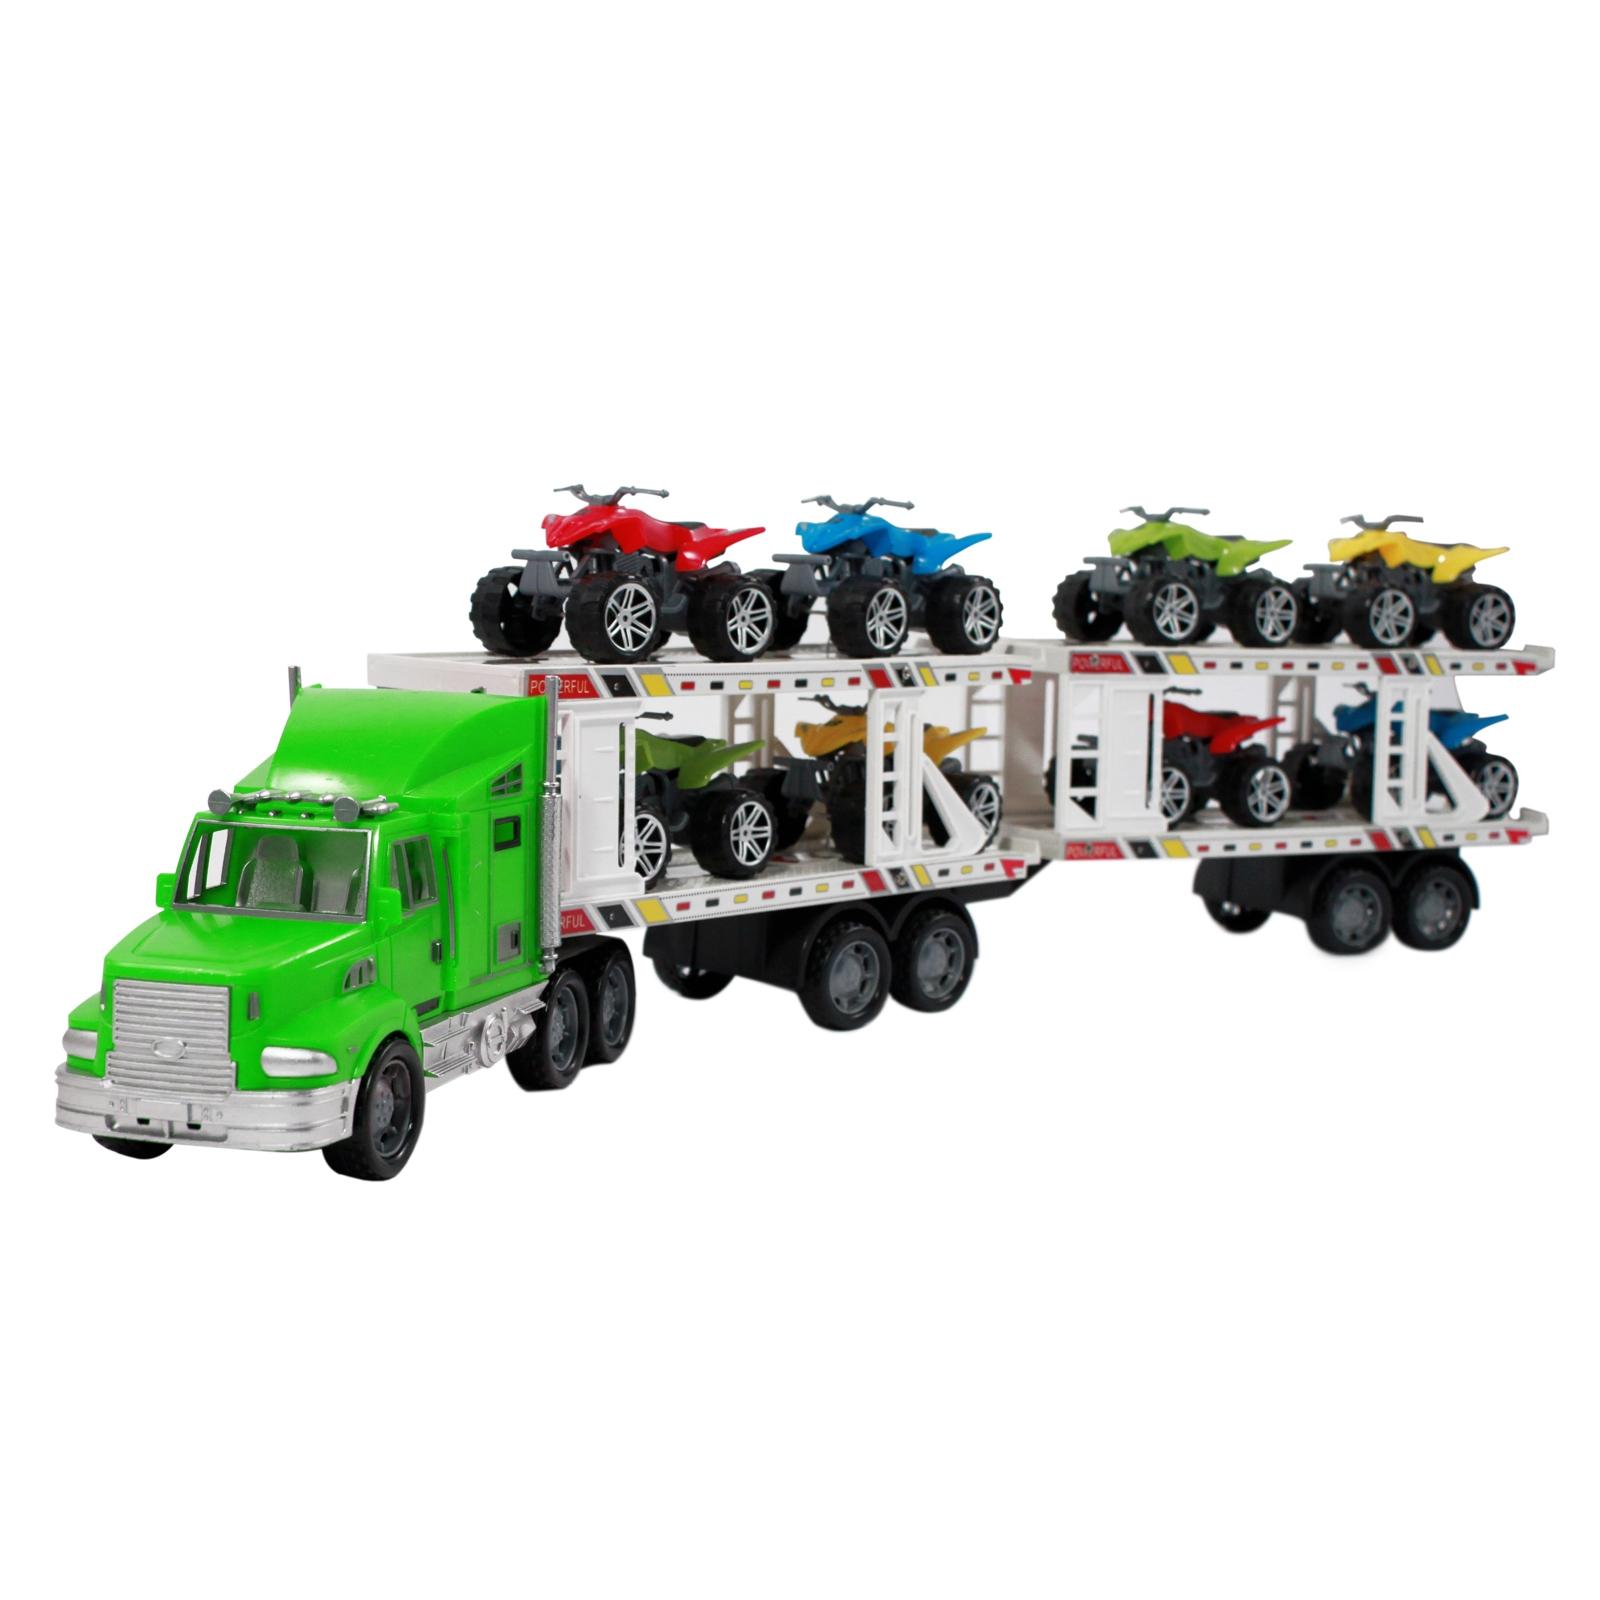 Deluxe green realistic semi truck auto hauler